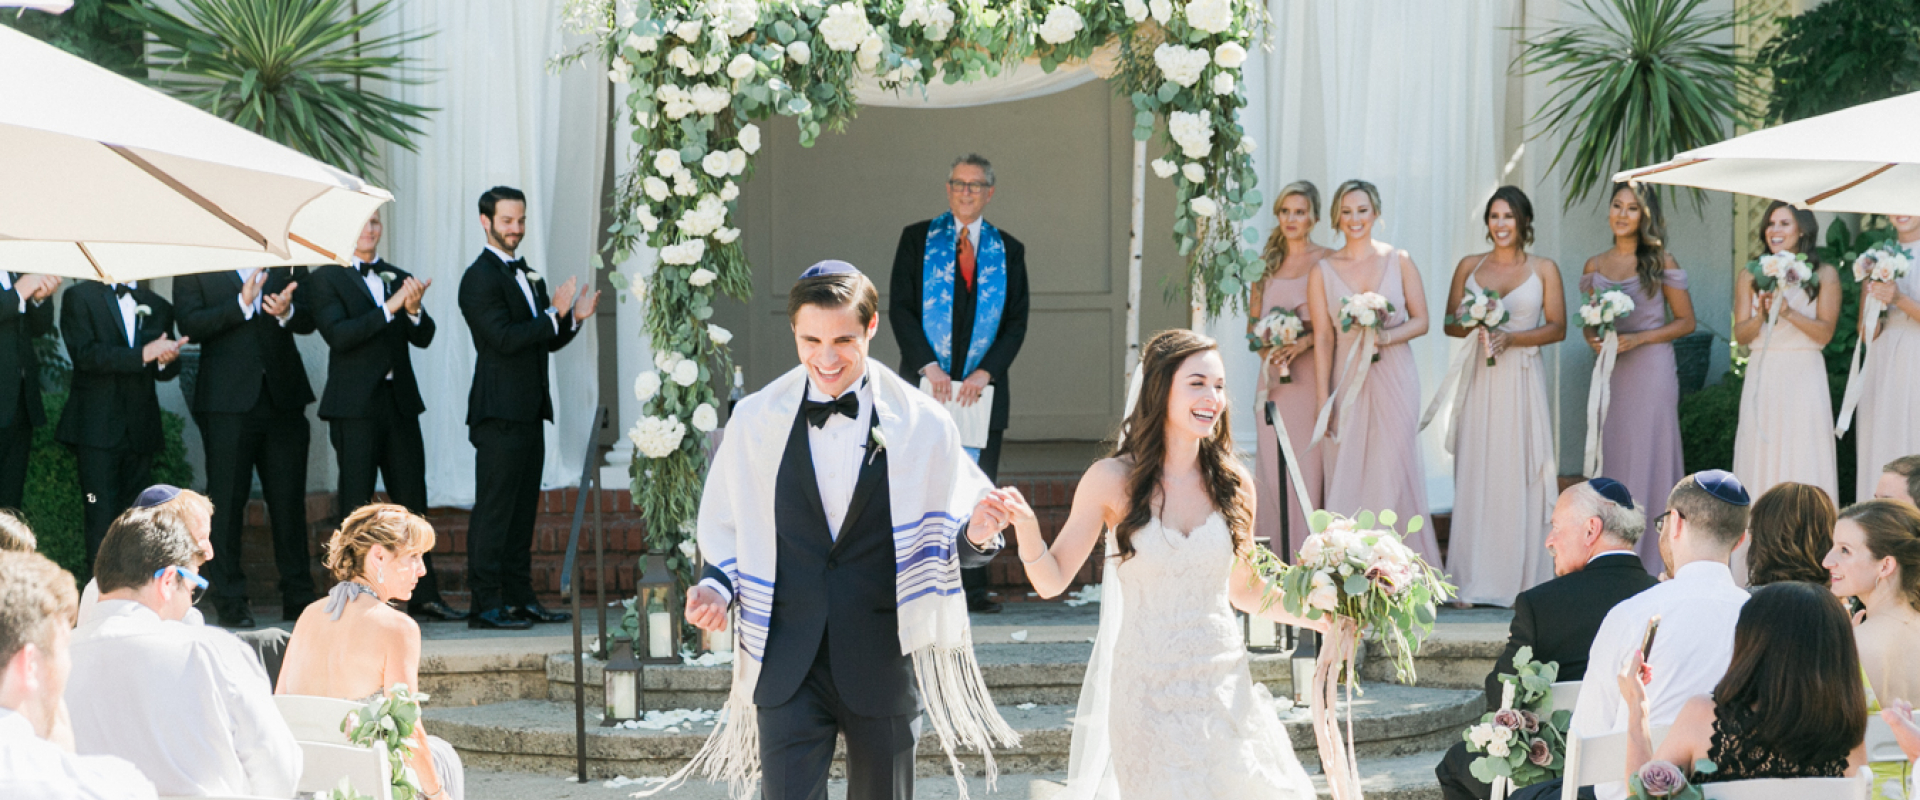 Jewish Wedding Recessional